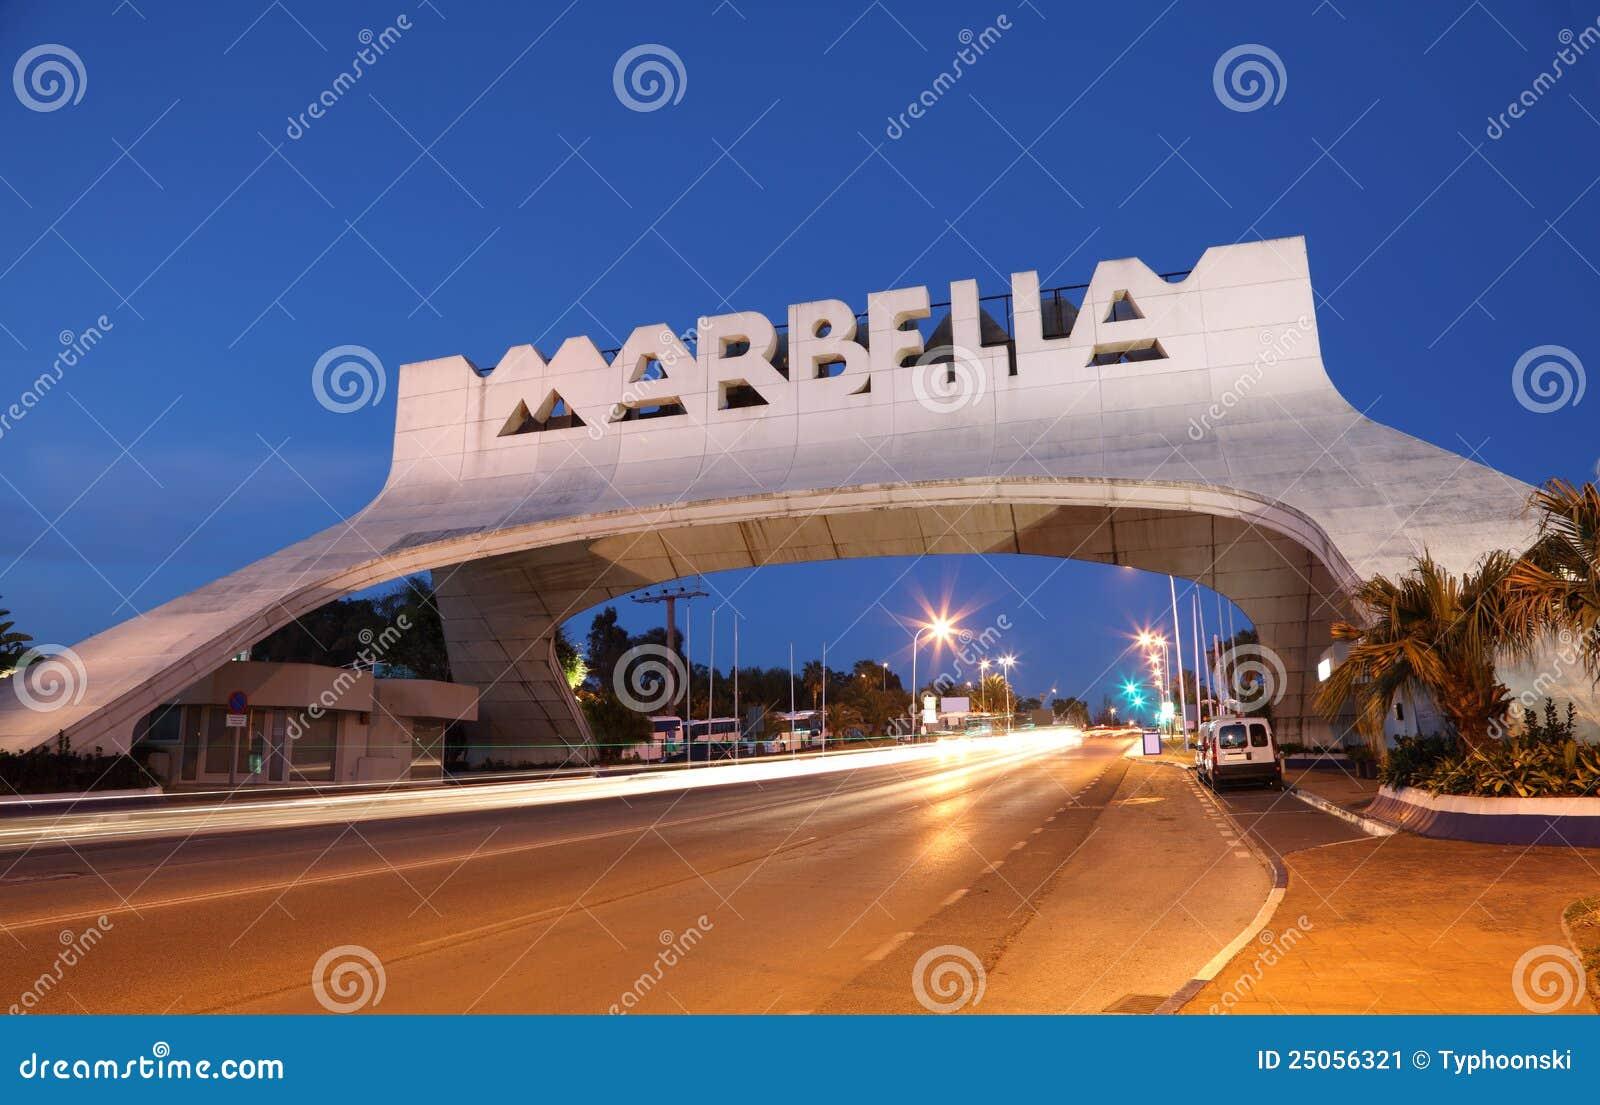 Marbella eskorte